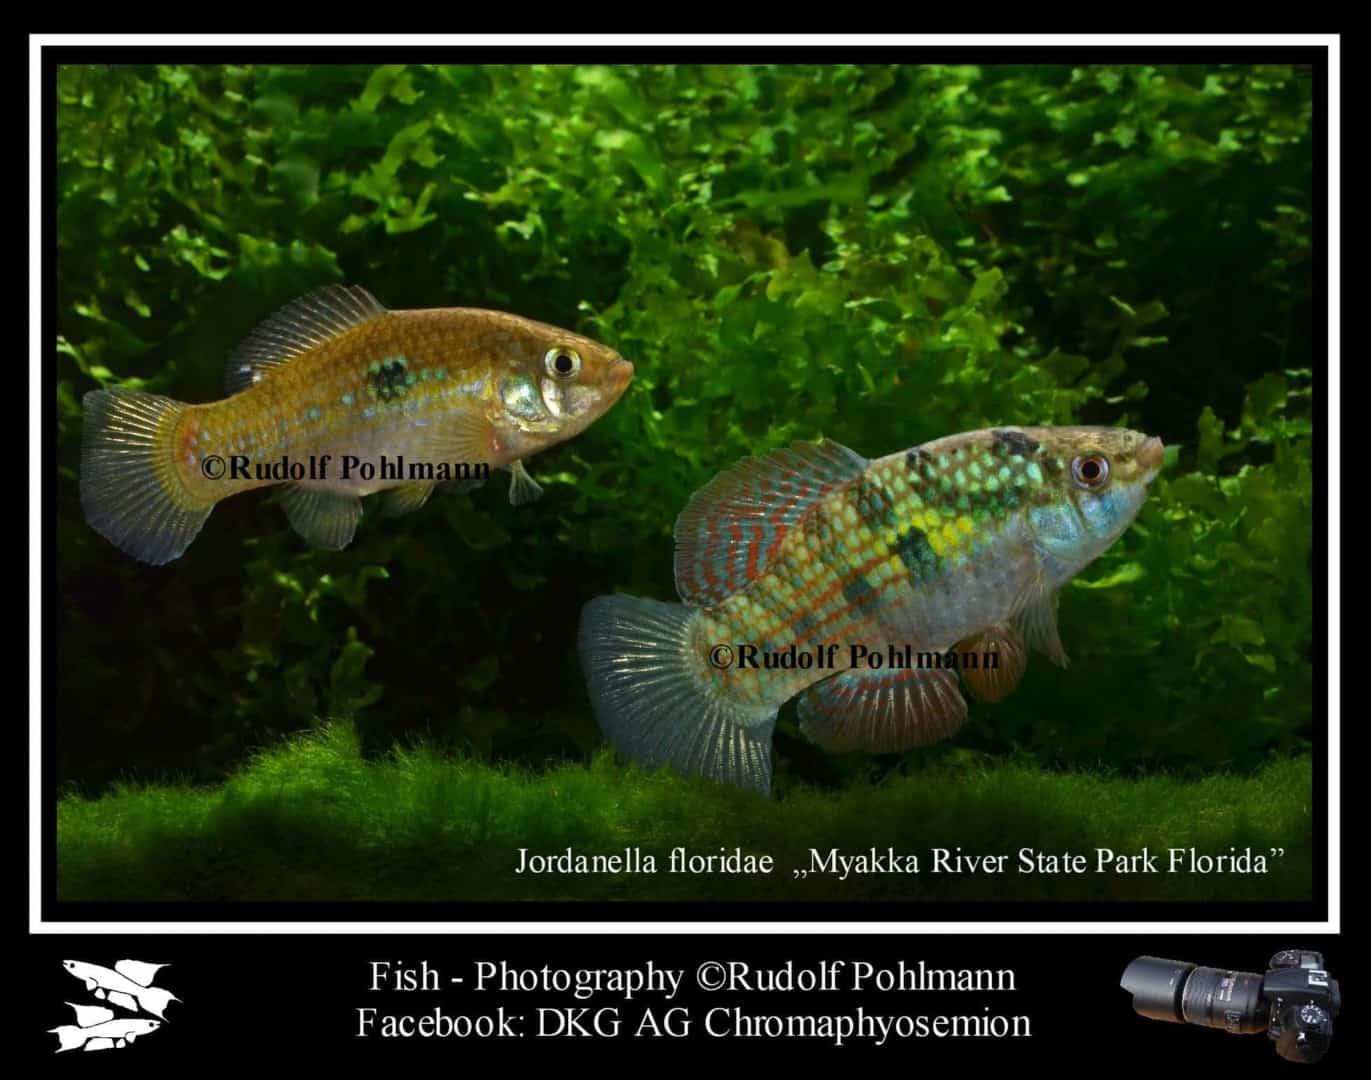 Jordanella floridae - Floridakärpfling 1